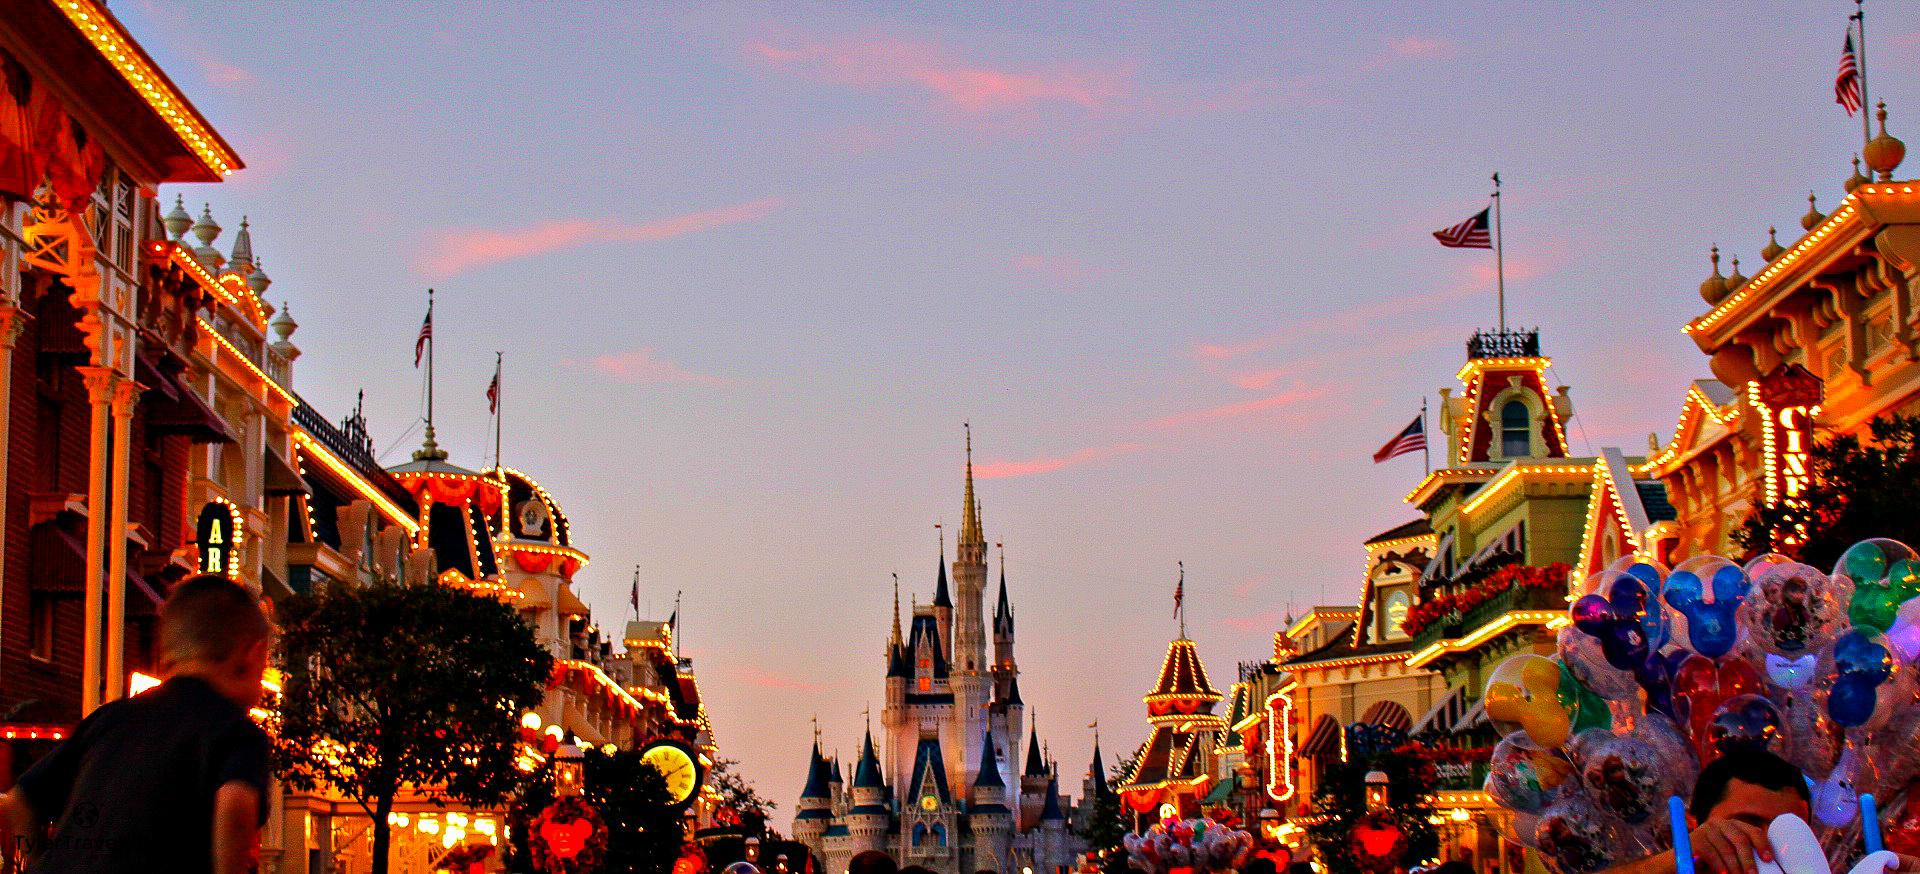 Disney Stock Photo-23.jpg